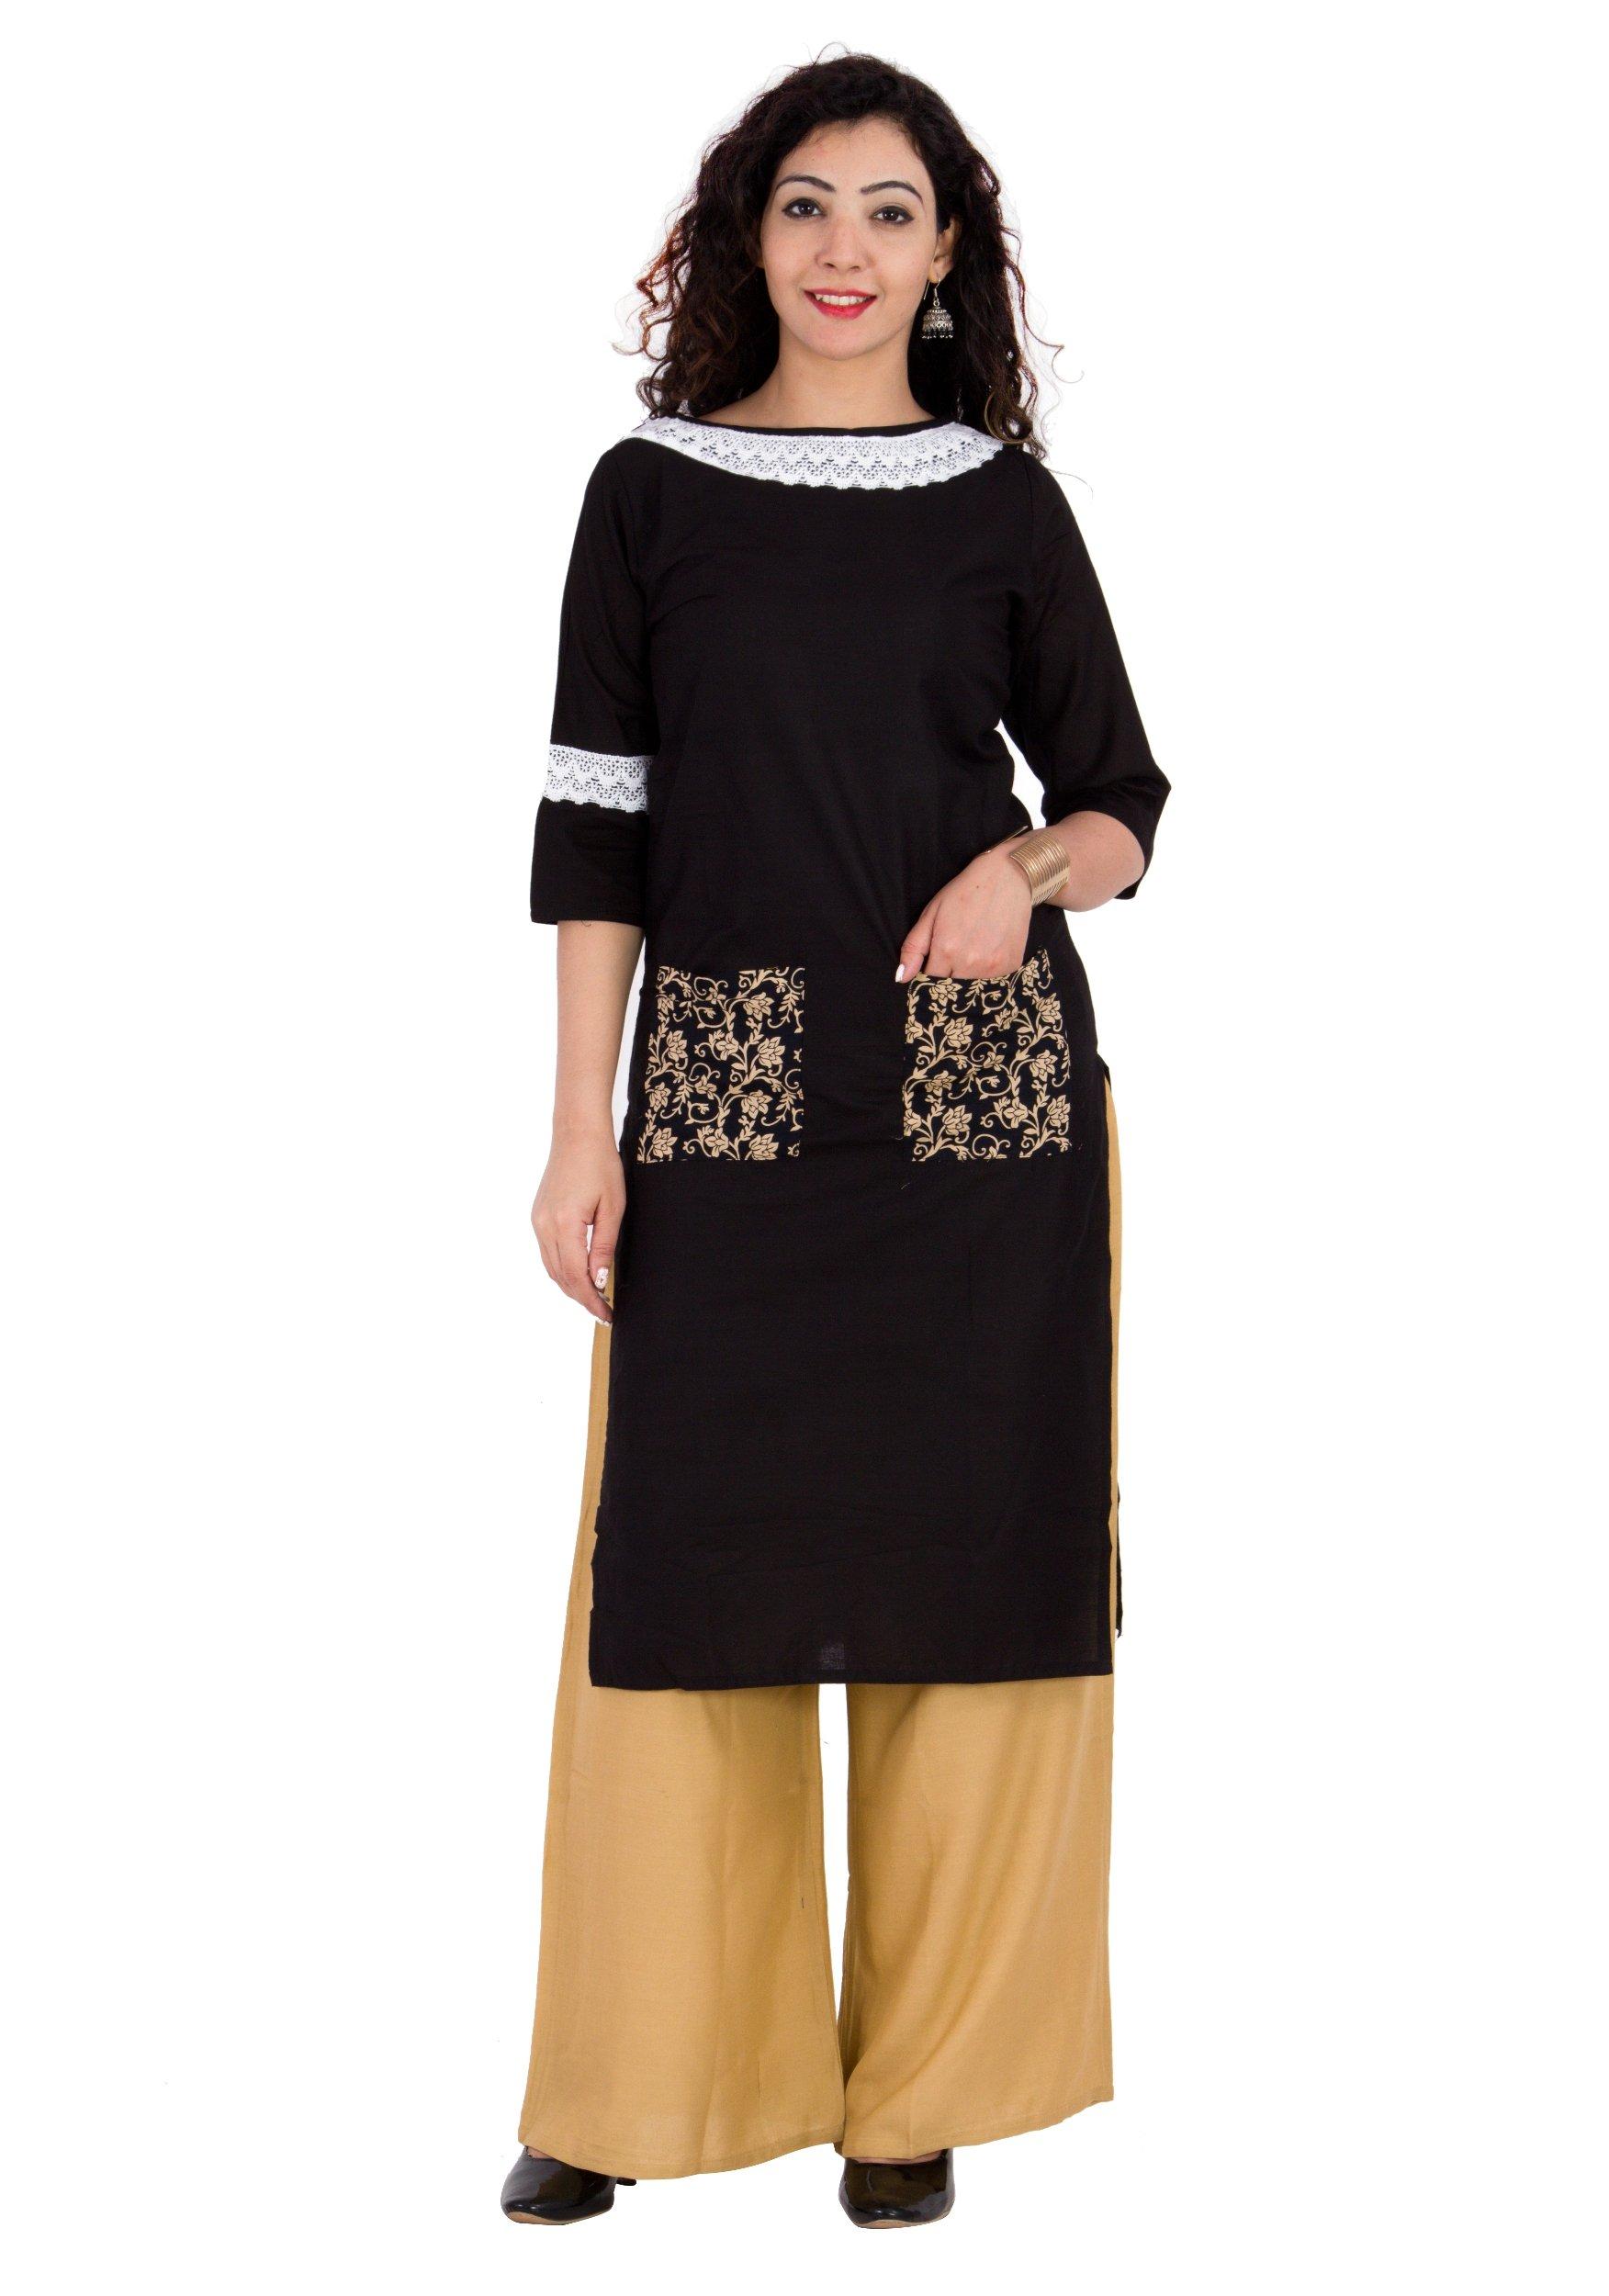 BrightJet Designer Black Cotton Lacework Women Fashion Kurti A-line Kurta Top Tunic with Rayon Solid Beige Plazzo Set Party Dress Casual (XXL)